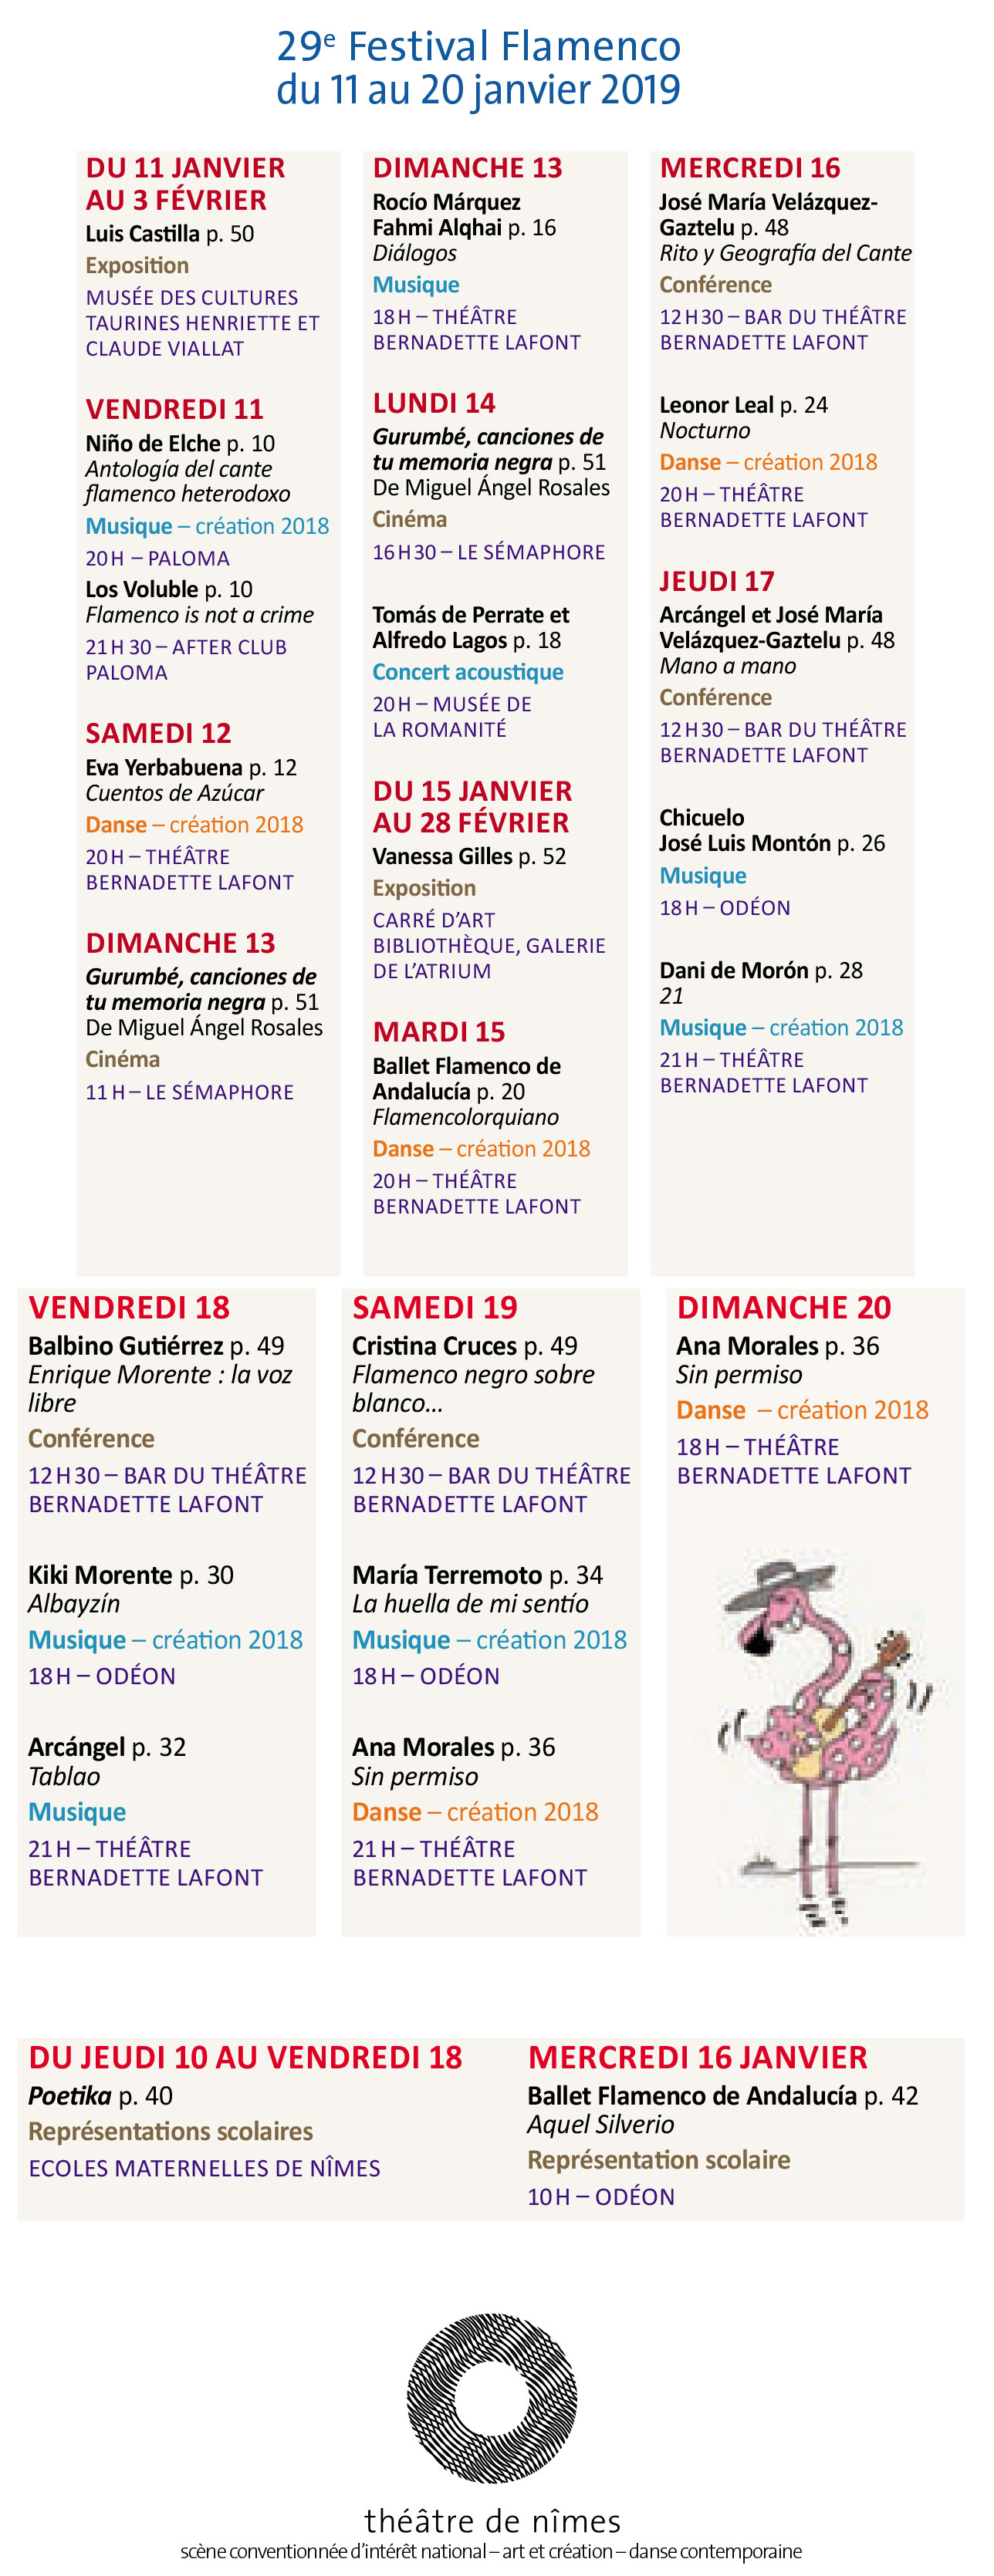 Festival Flamenco Nimes 2019